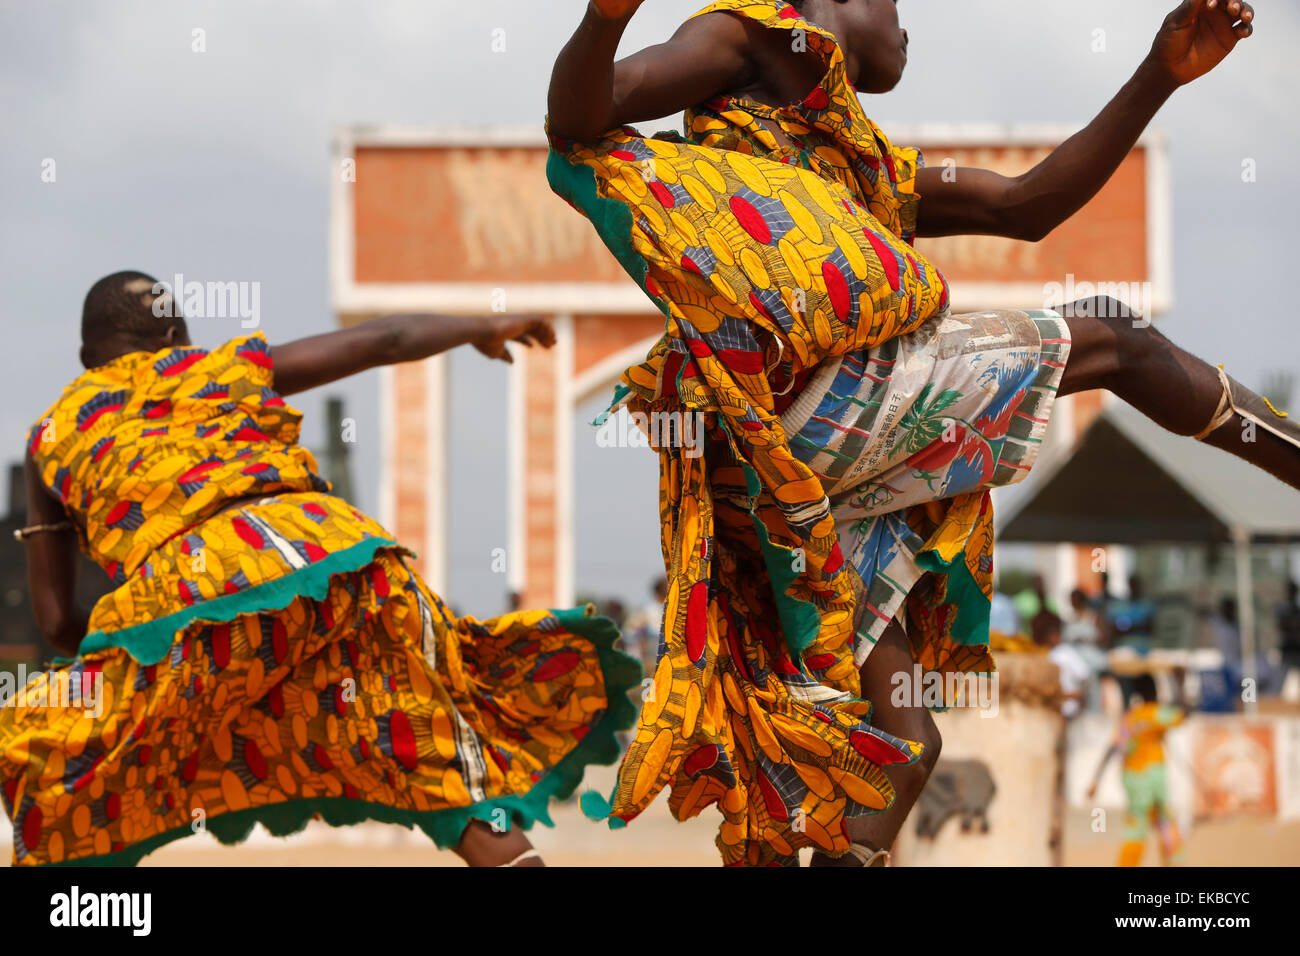 Devotees of Sag bata the Voodoo god of death, disease and pestilence, dancing at the Ouidah Voodoo festival, Ouidah, - Stock Image